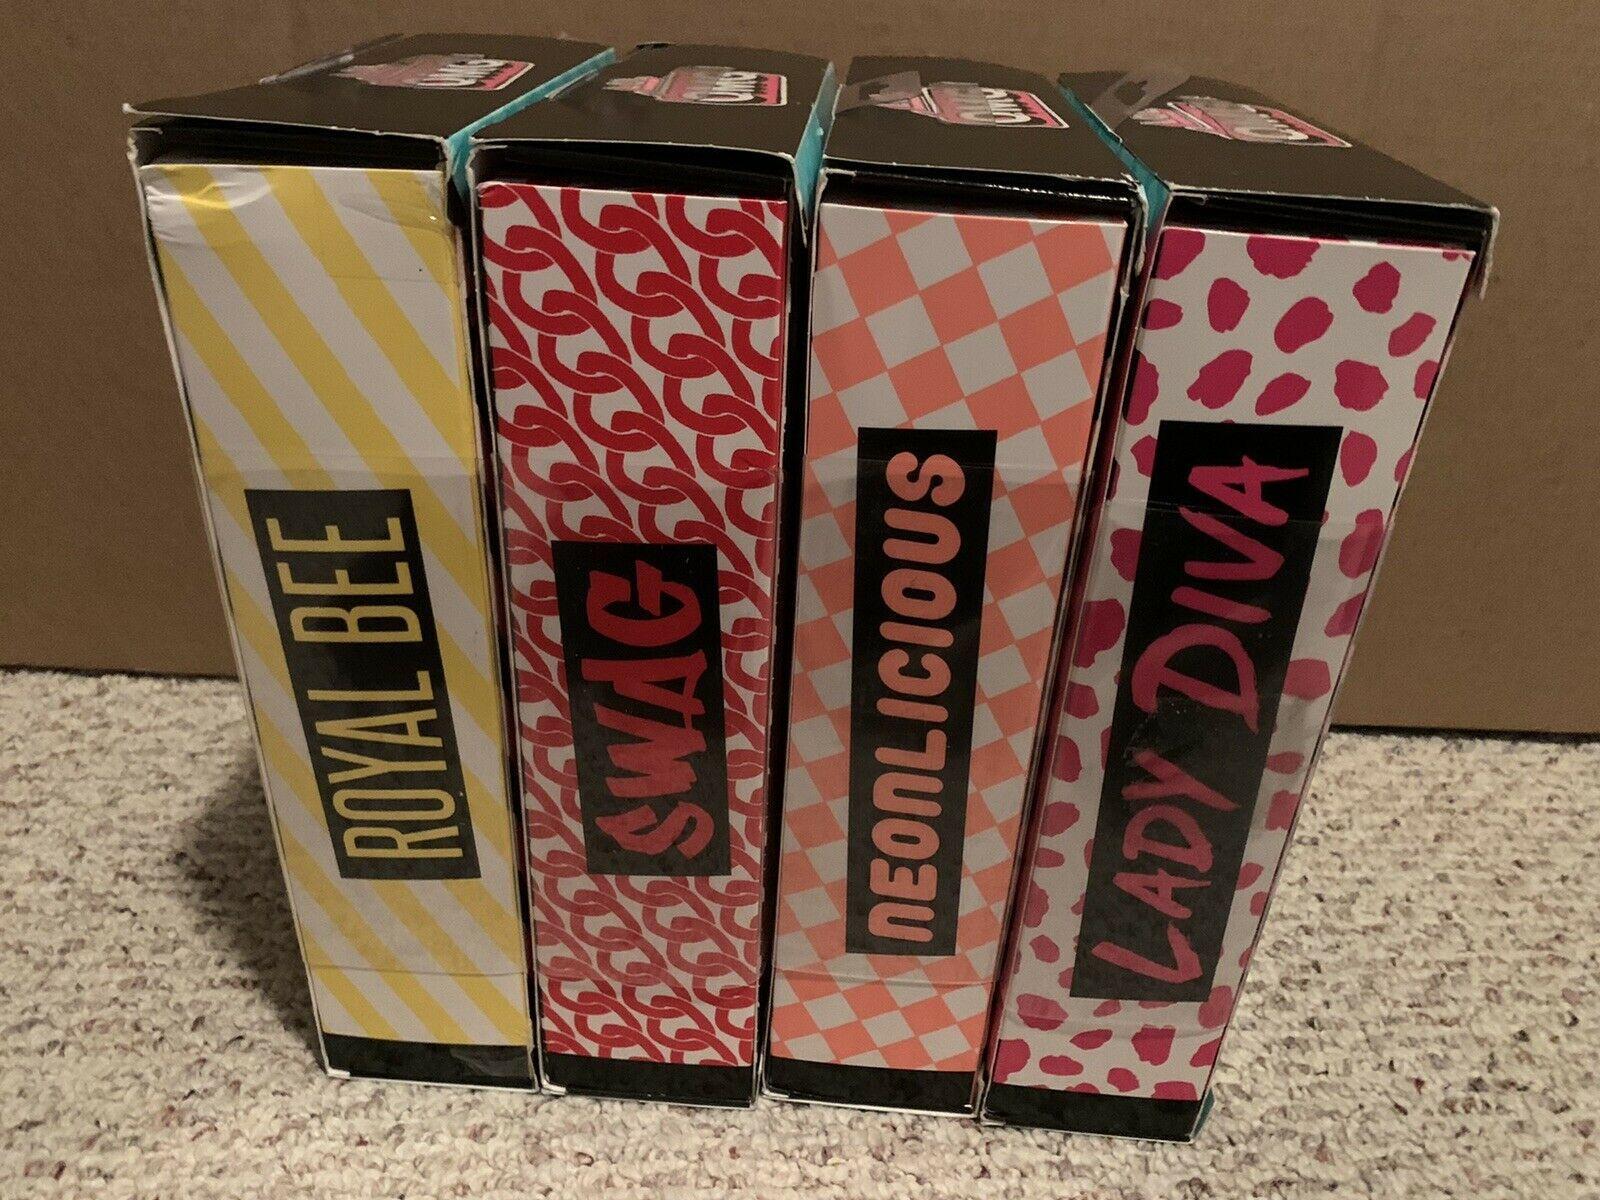 Lol Surprise Omg Fashion Dolls Series 1 Complete Set Of 4 Damaged Box Ships Free Surprise Box Ideas Of Surprise Box Surprisebox Surprise Box Box Surprise